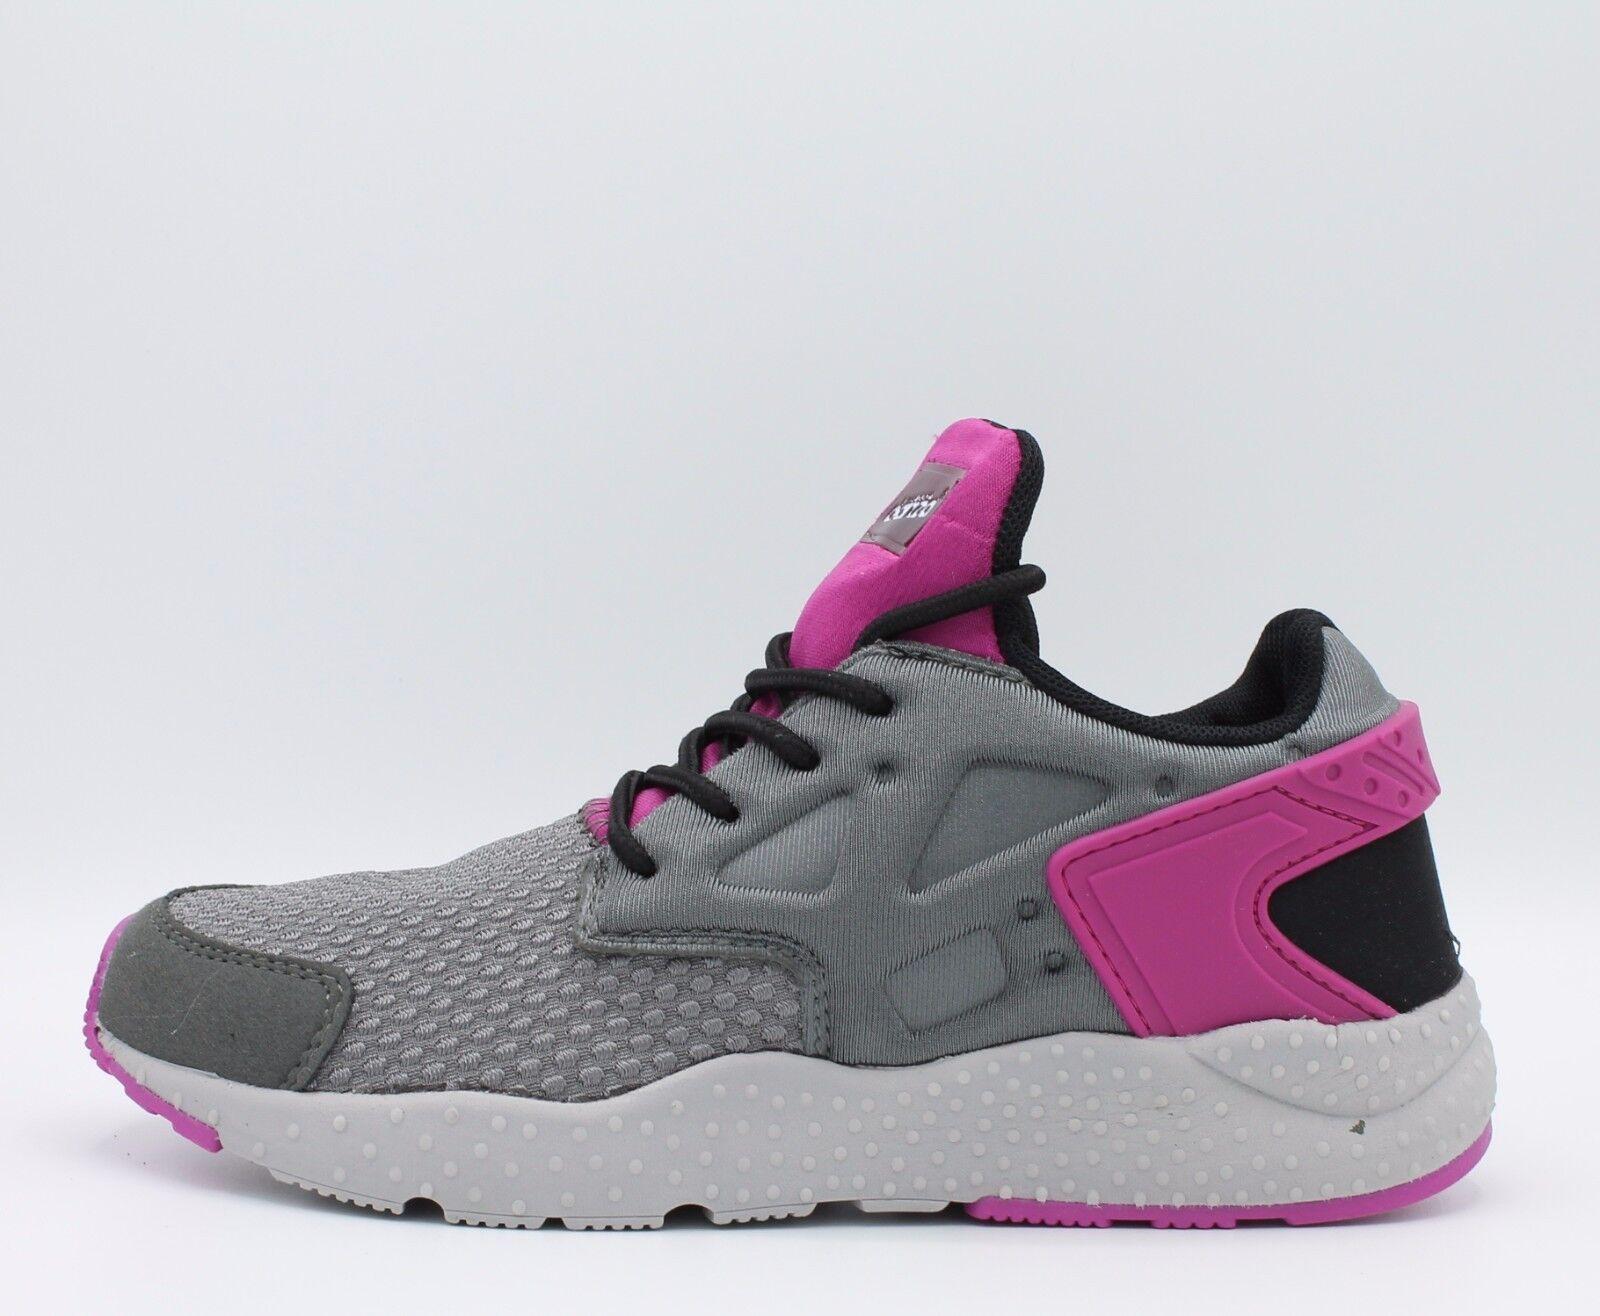 Talla DANZA zapatos zapatillas mujer plantar espuma de memoria Fashion gris